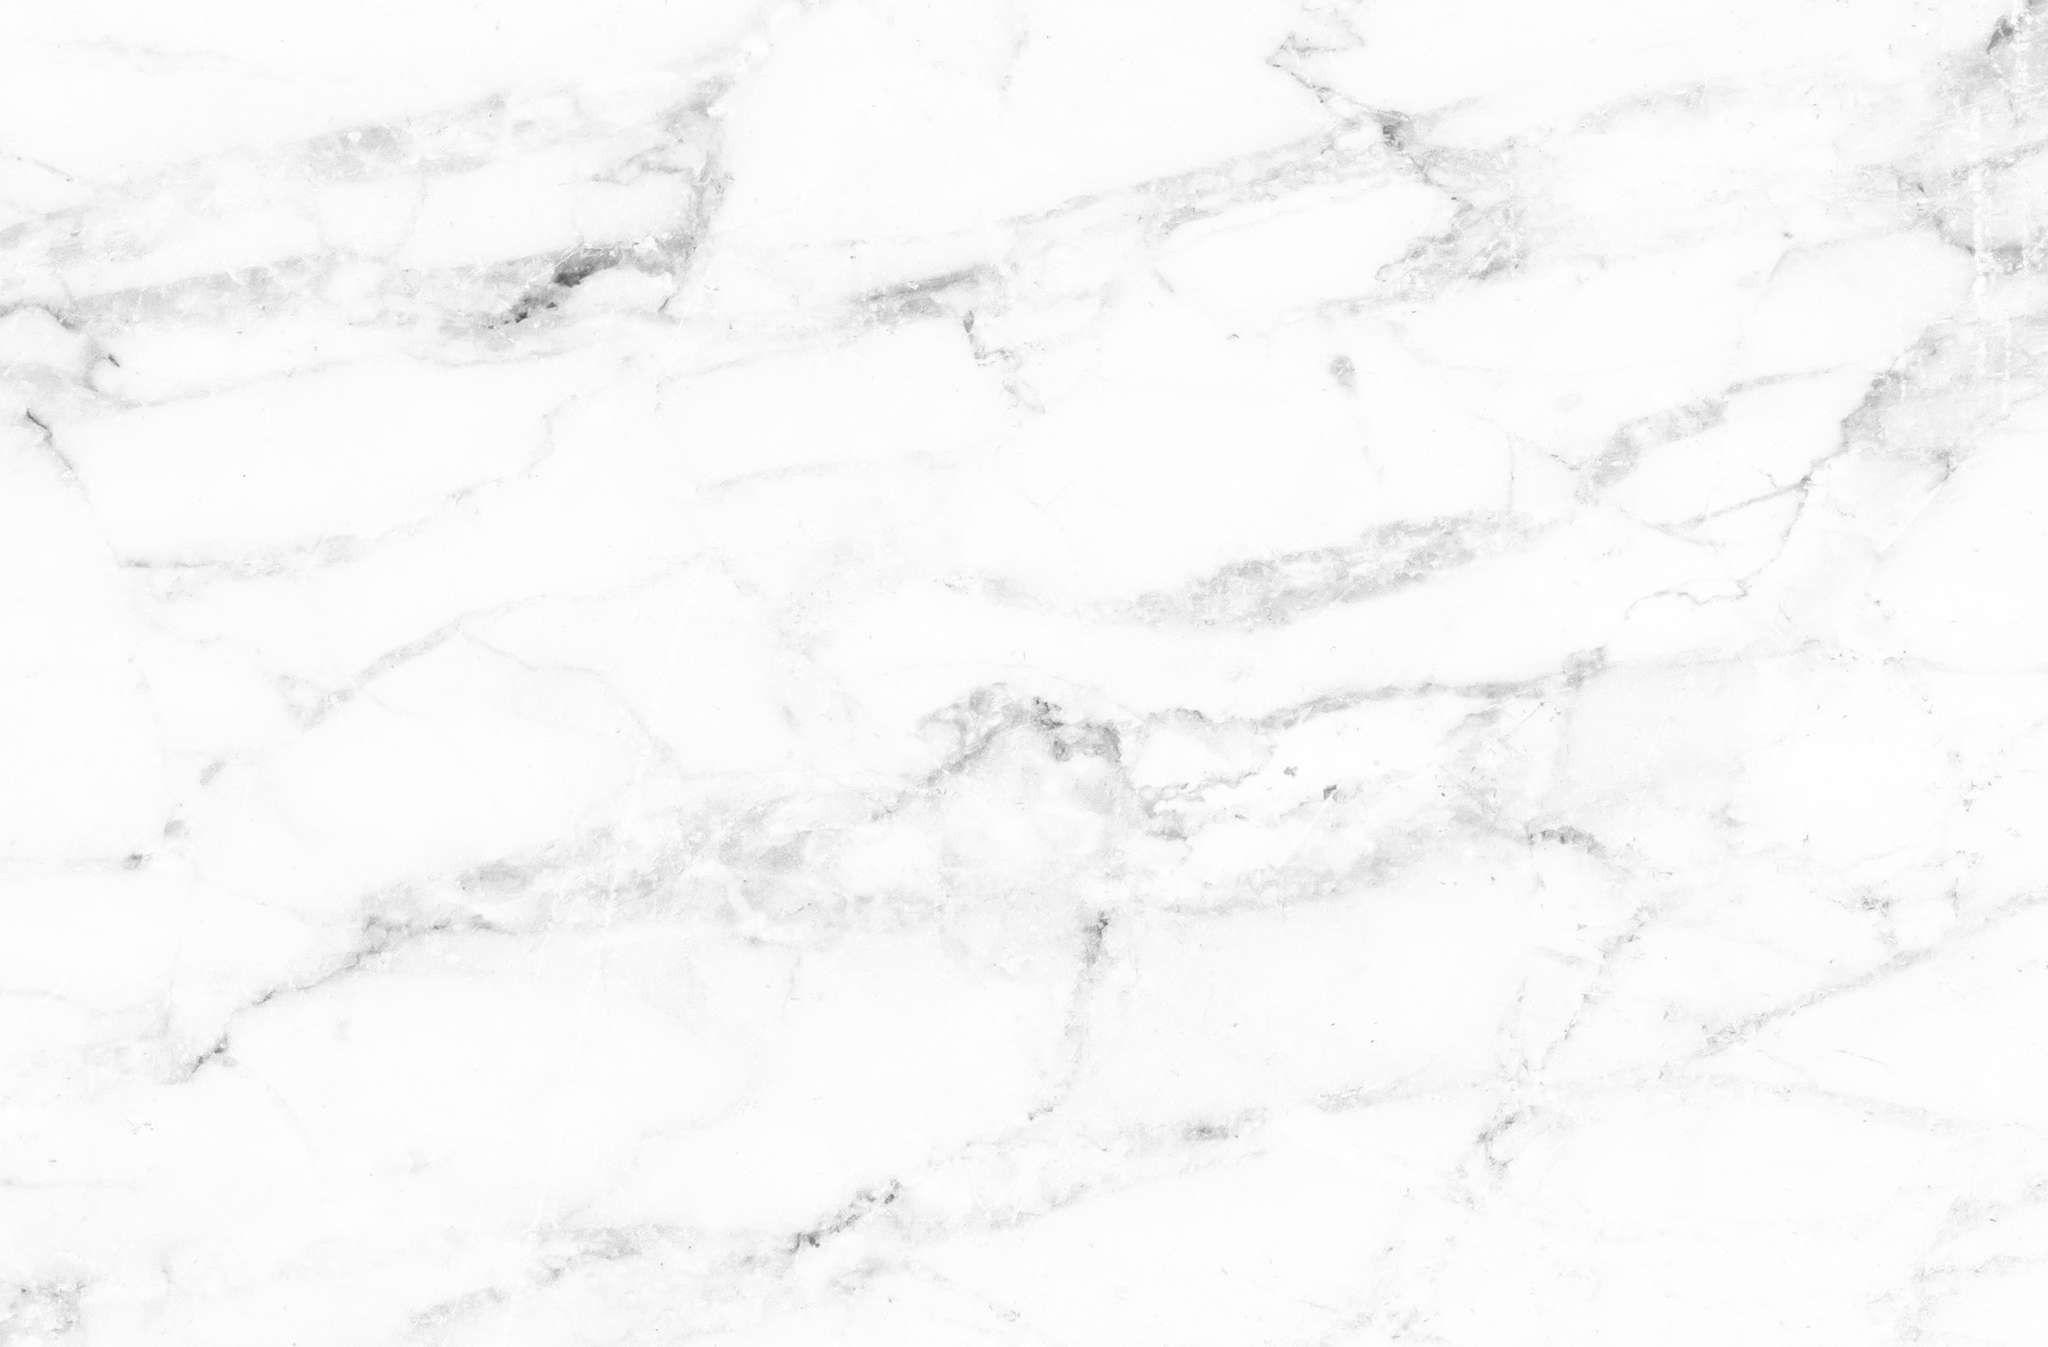 2048x1347 Download This Wallpaper Aesthetic Desktop Wallpaper Marble Desktop Wallpaper Rose Gold Marble Wallpaper